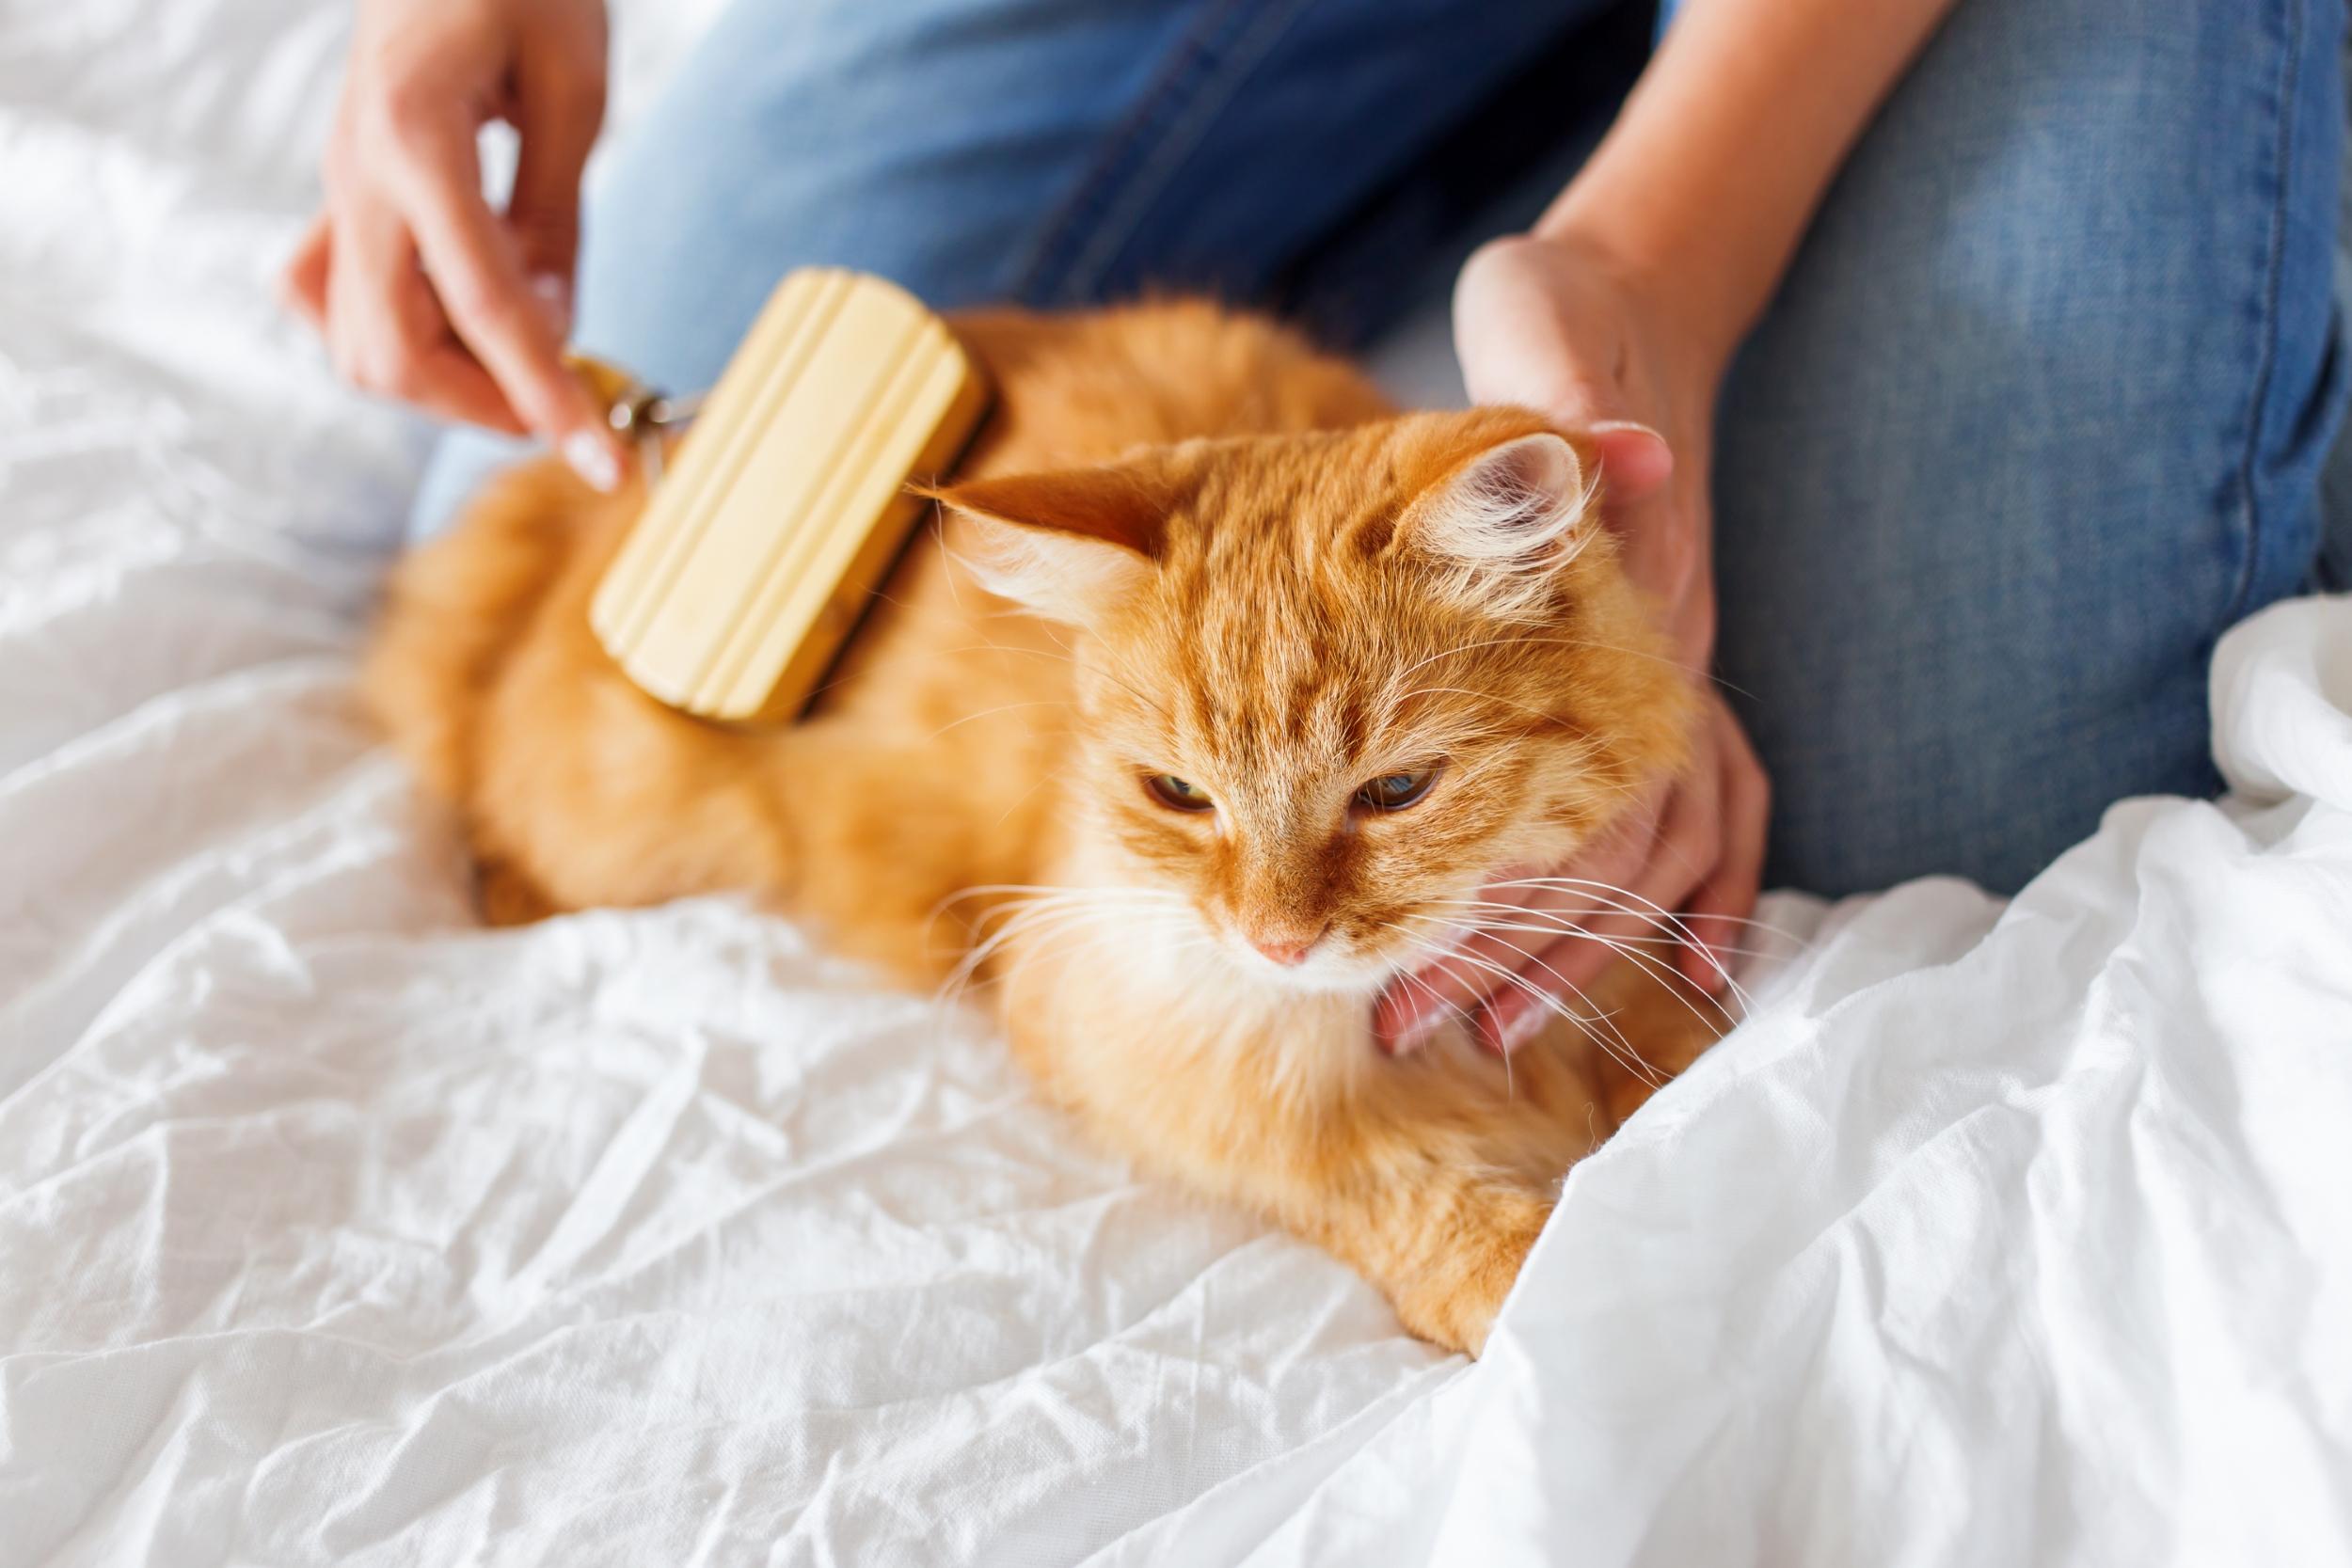 cat rubbing back on carpet